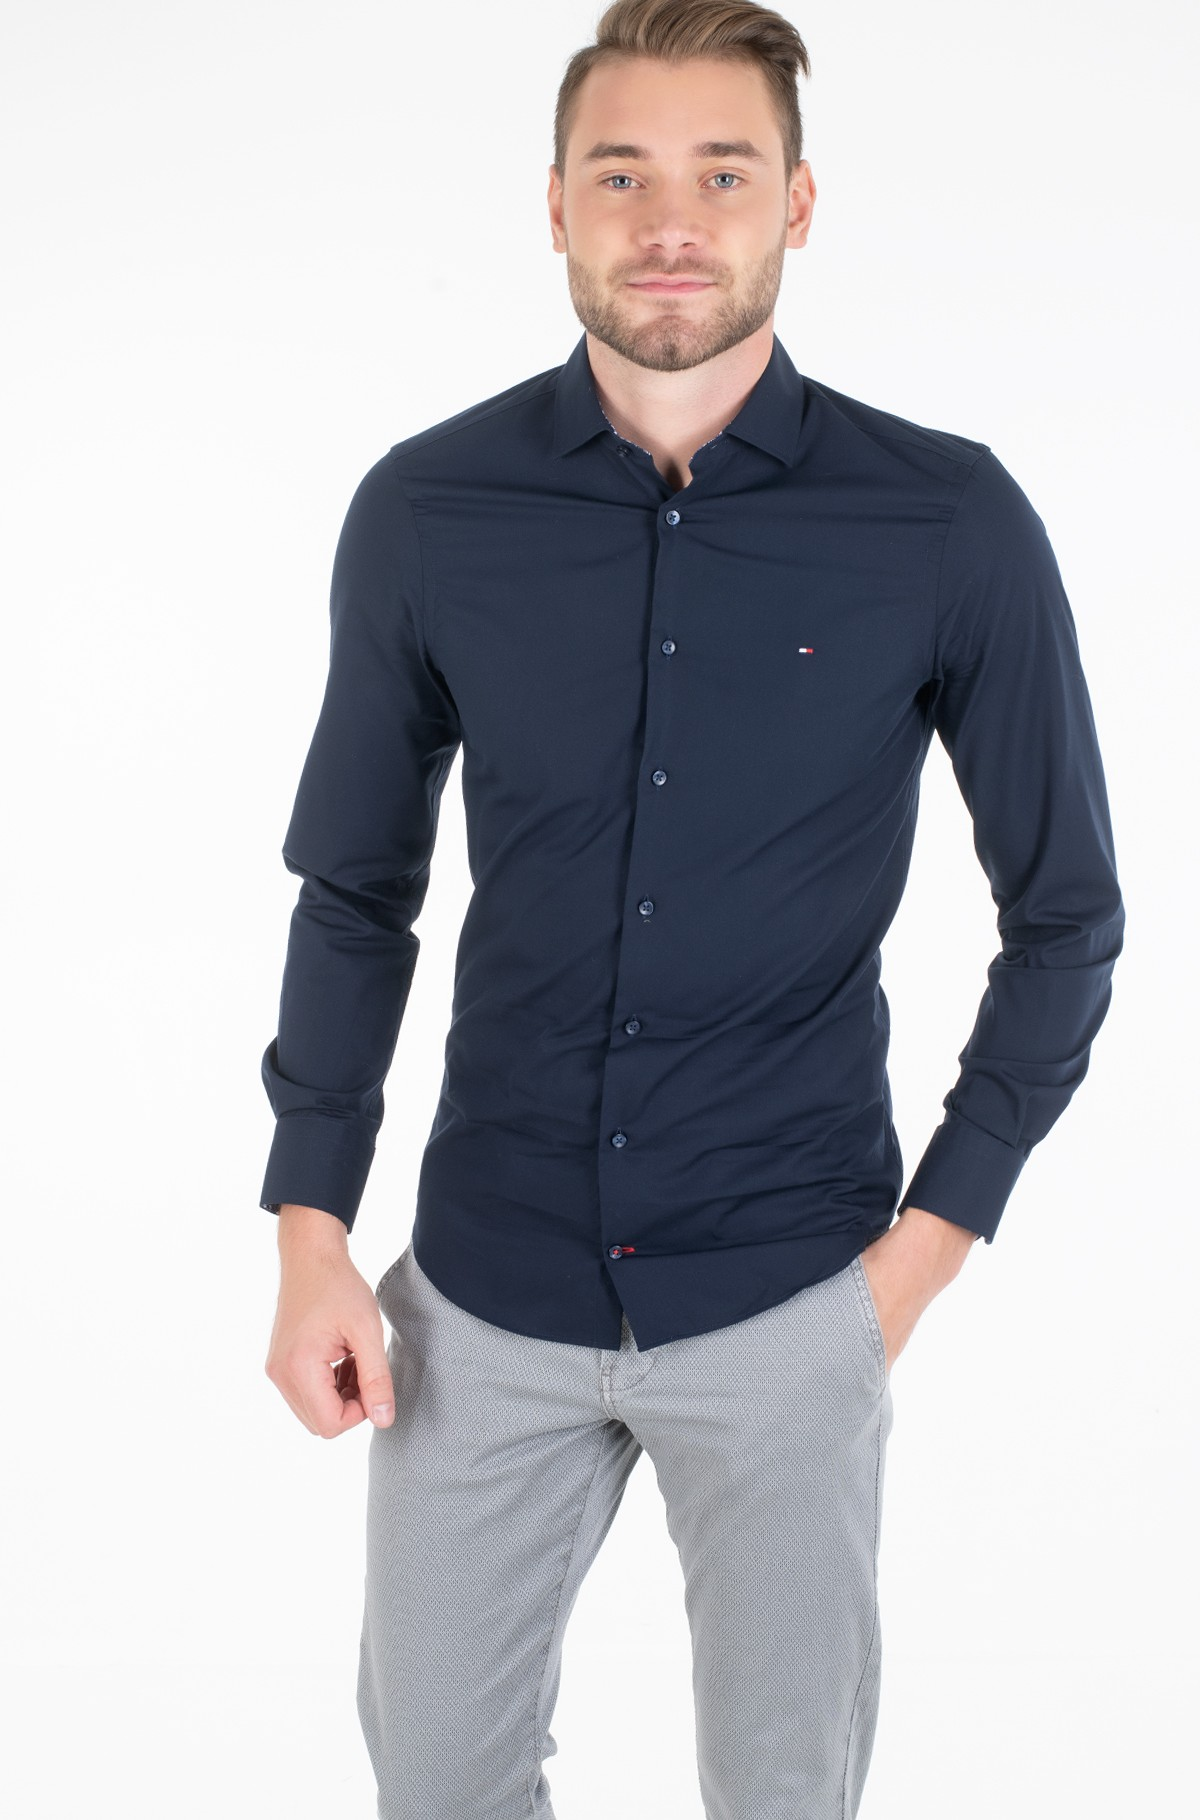 Marškiniai POPLIN CLASSIC SLIM SHIRT-full-1